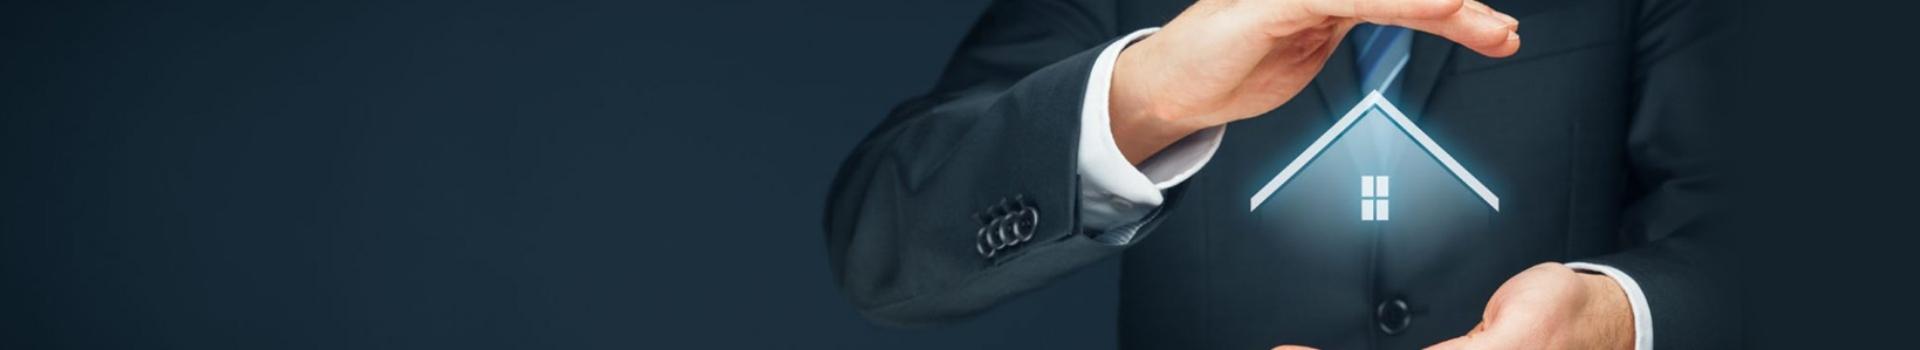 "<a href=""https://www.equityvp.com/deal"">CAMPAIGNS</a><span class=""slug"">&nbsp; &rsaquo; &nbsp;</span>Real Estate Deal"